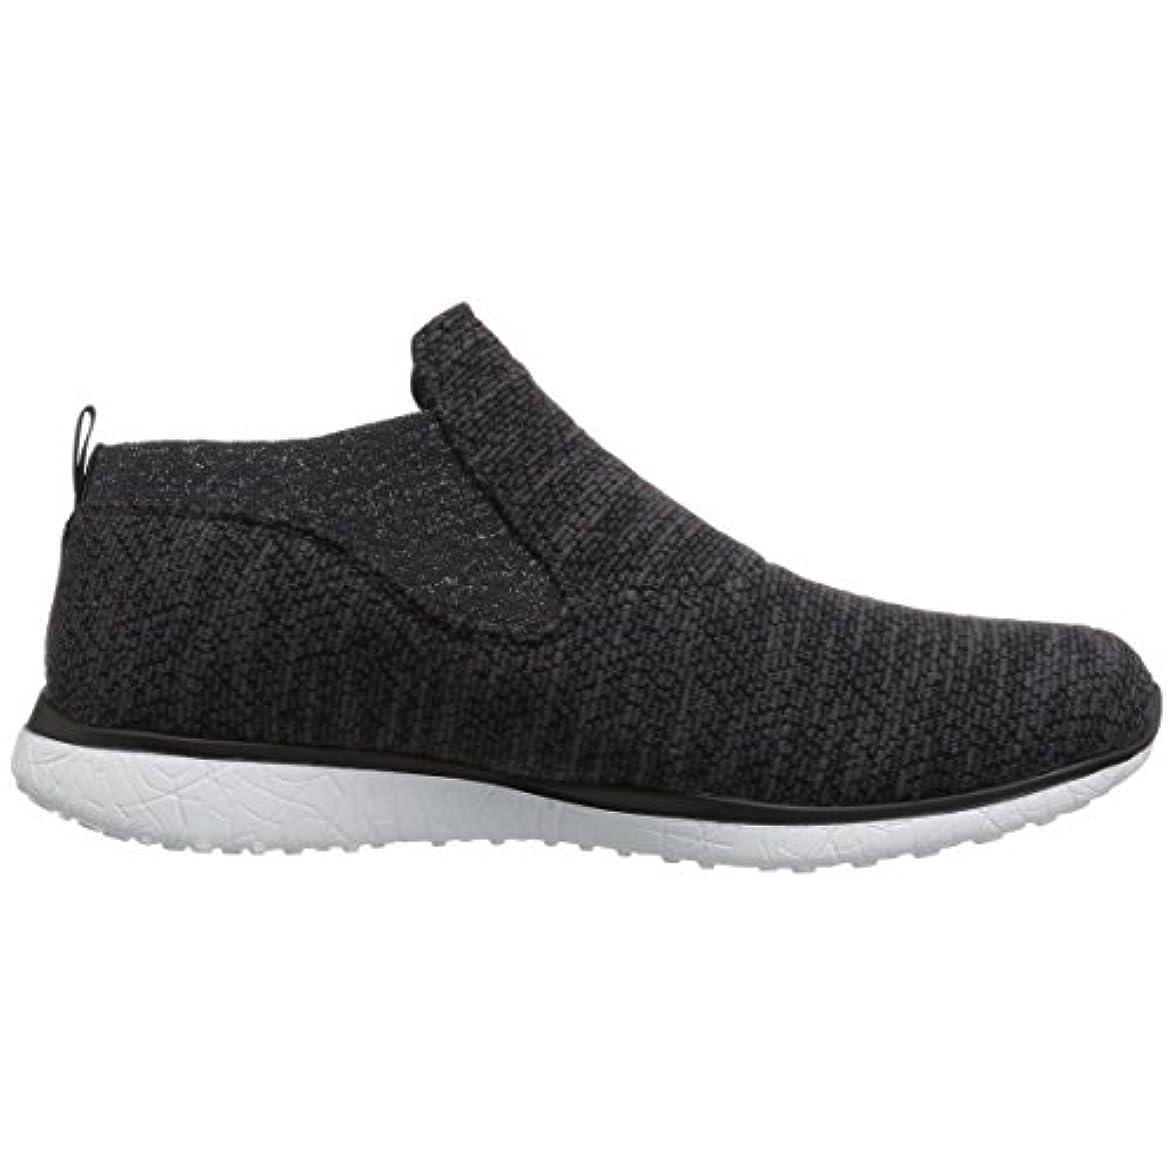 Sport Donna Microburst Supersonic Fashion Sneaker Nero Bianco 8 M Us